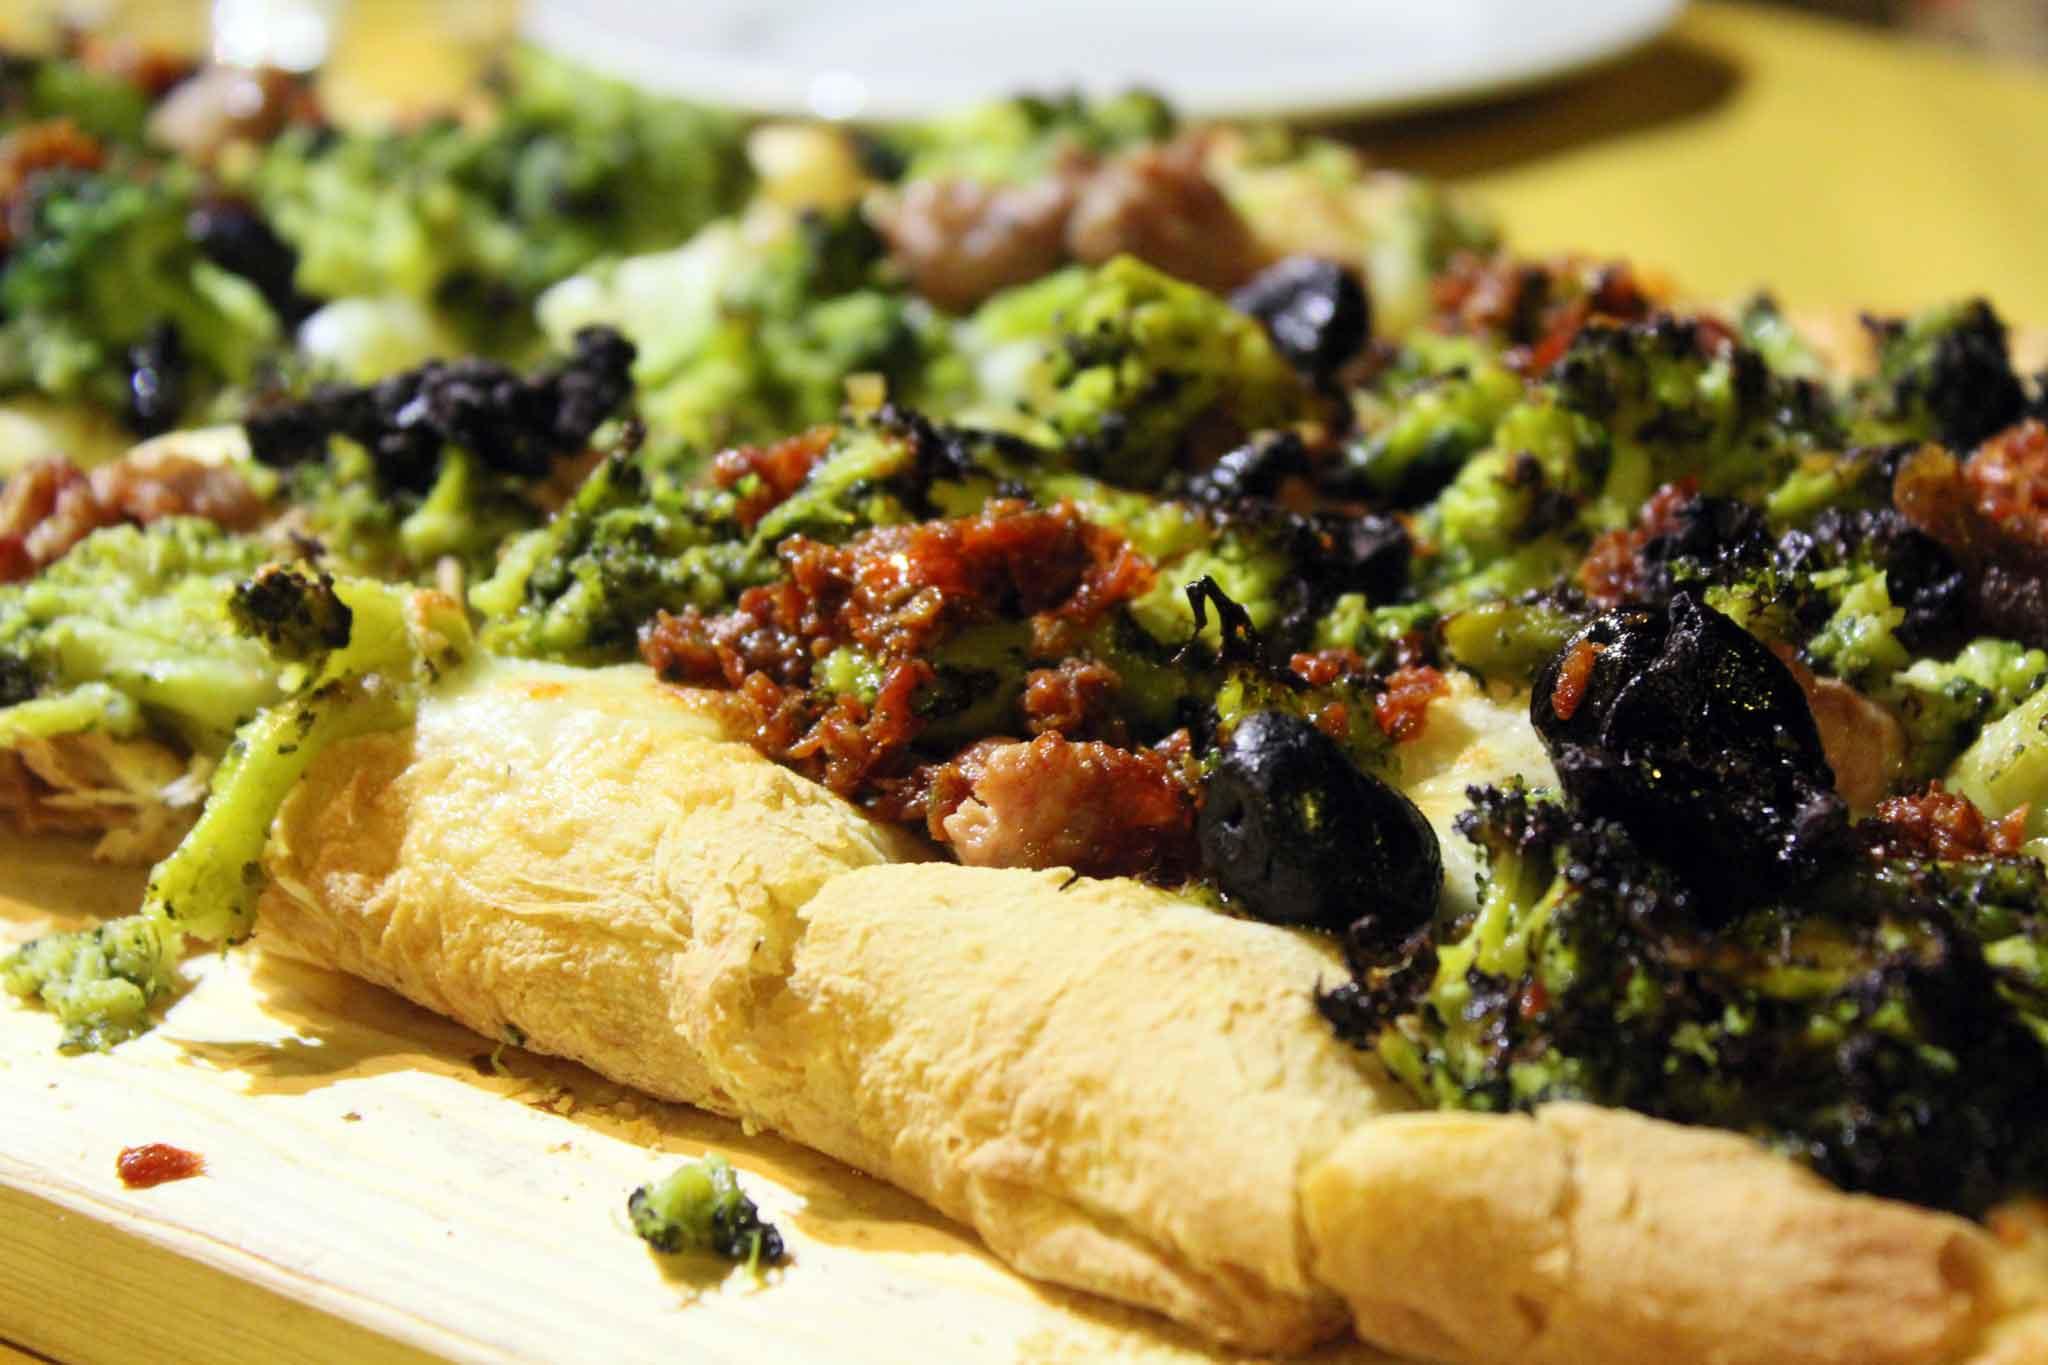 pizzeria Sacre Pietre Sicilia scrocchiarella